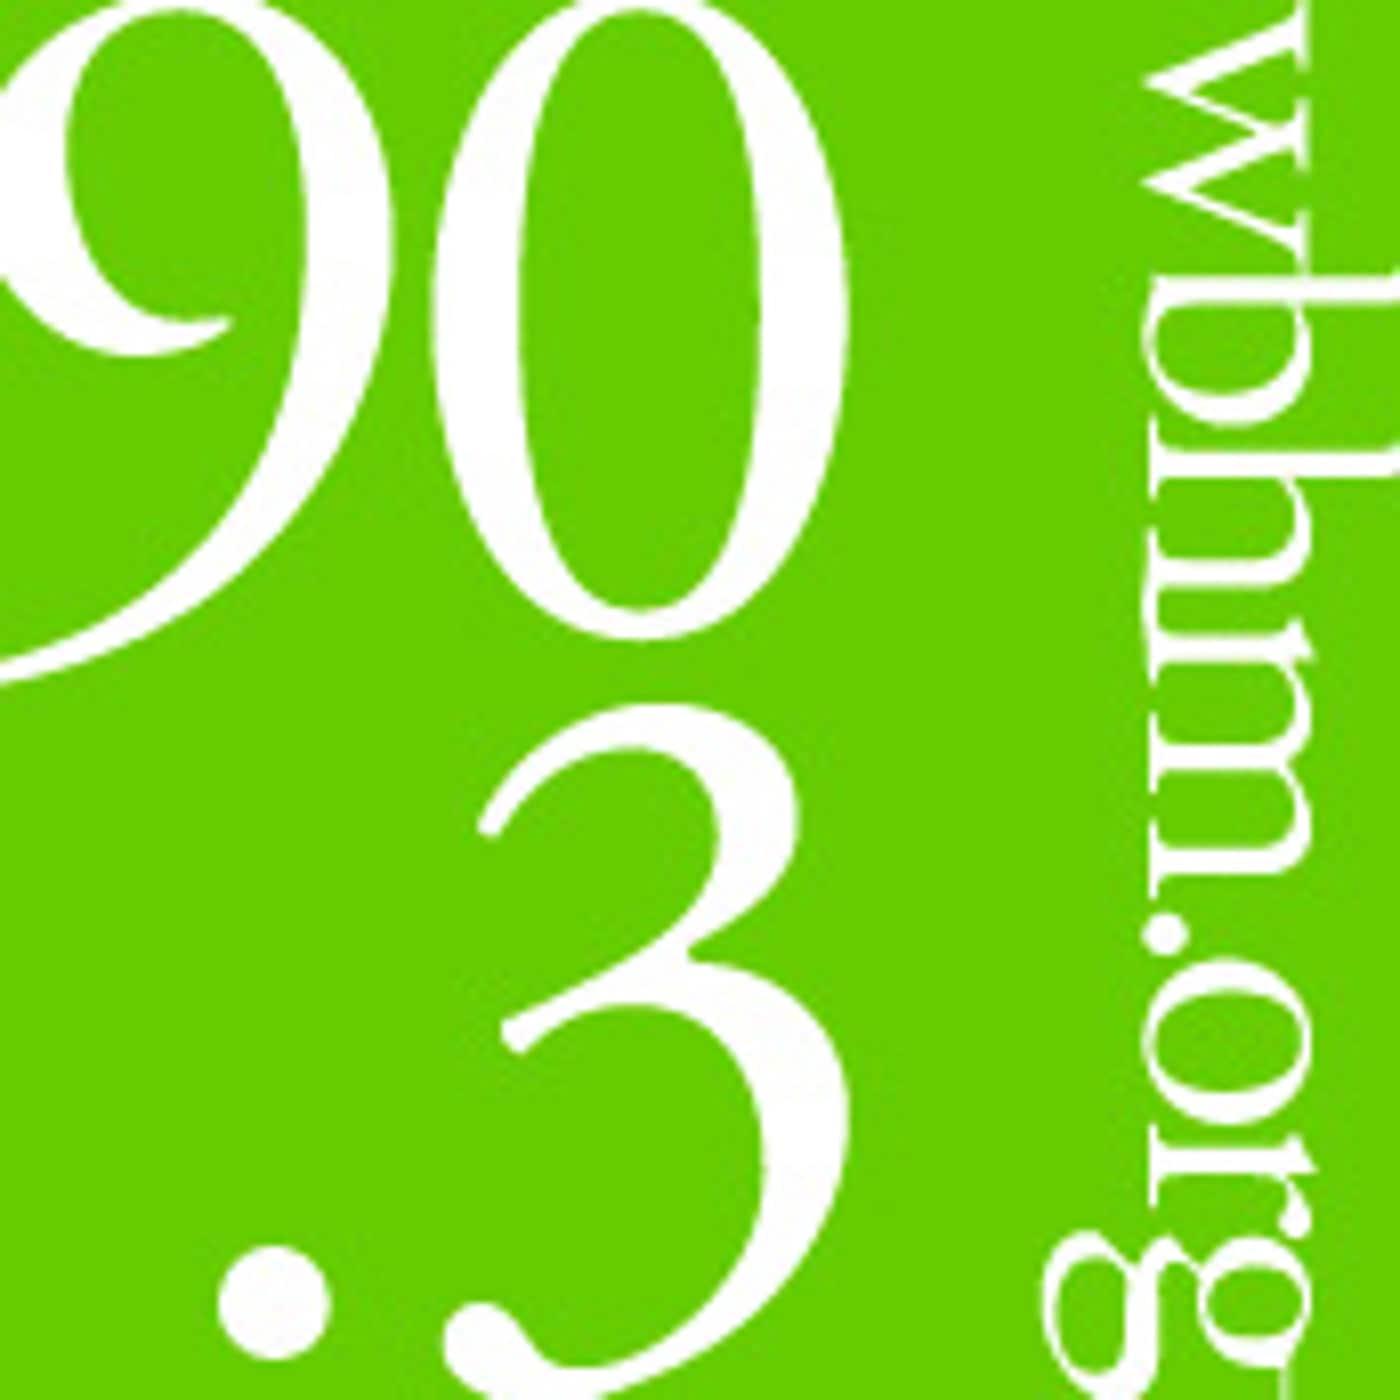 WBHM 90.3